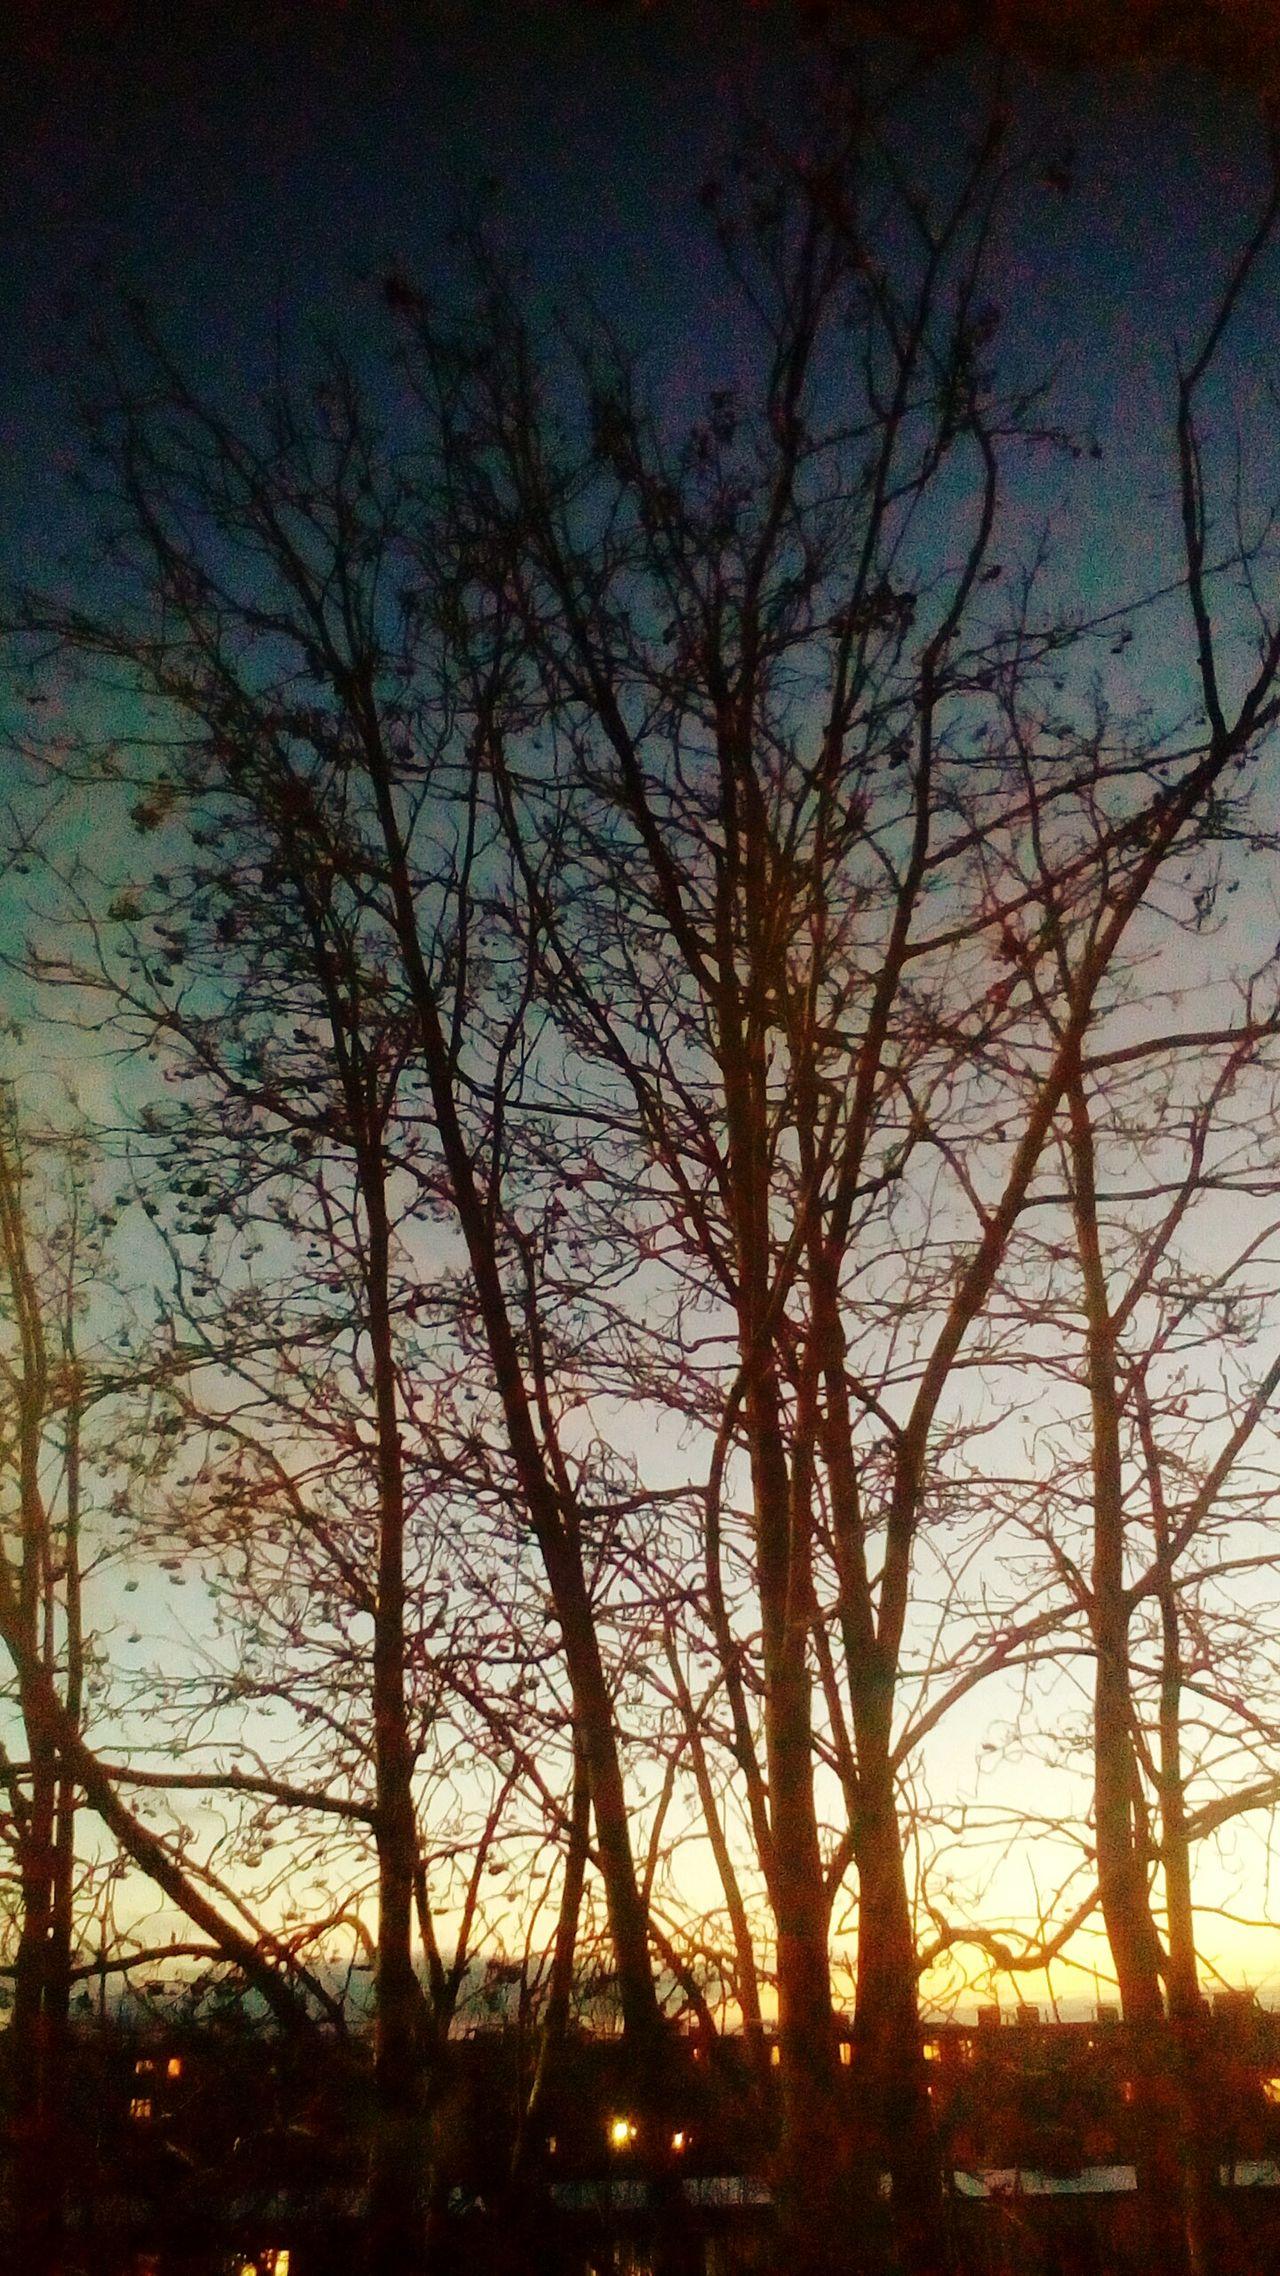 закат🌇 вгостях красота -10° холод